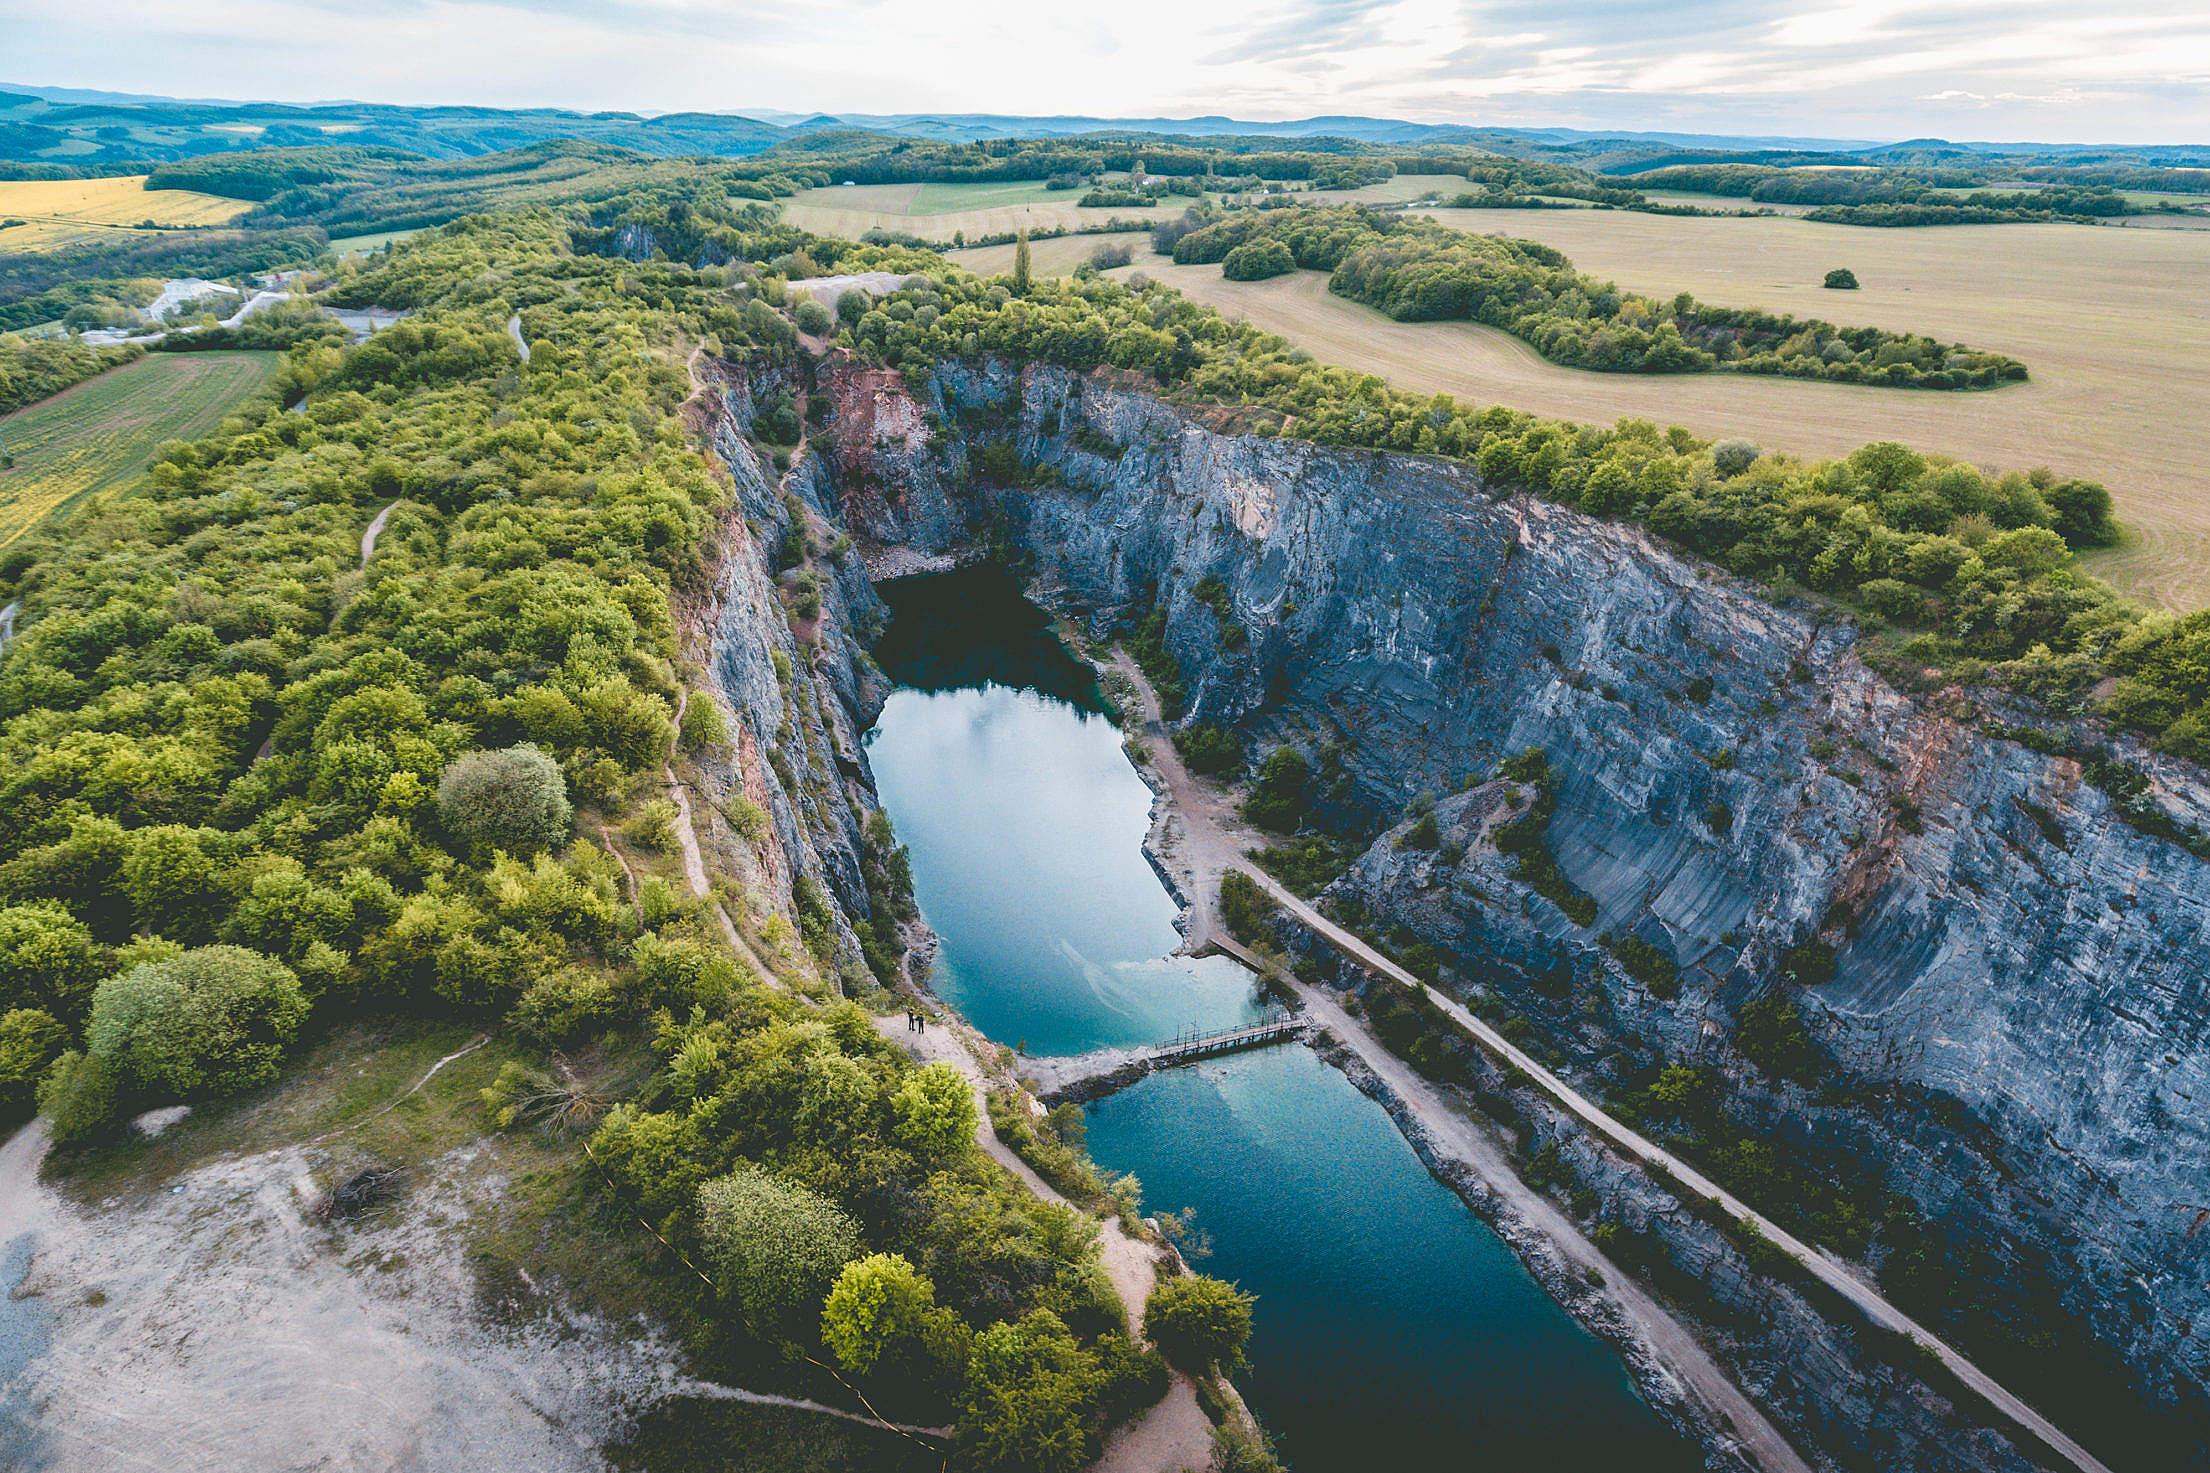 Velka Amerika Quarry, Czech Republic Free Stock Photo